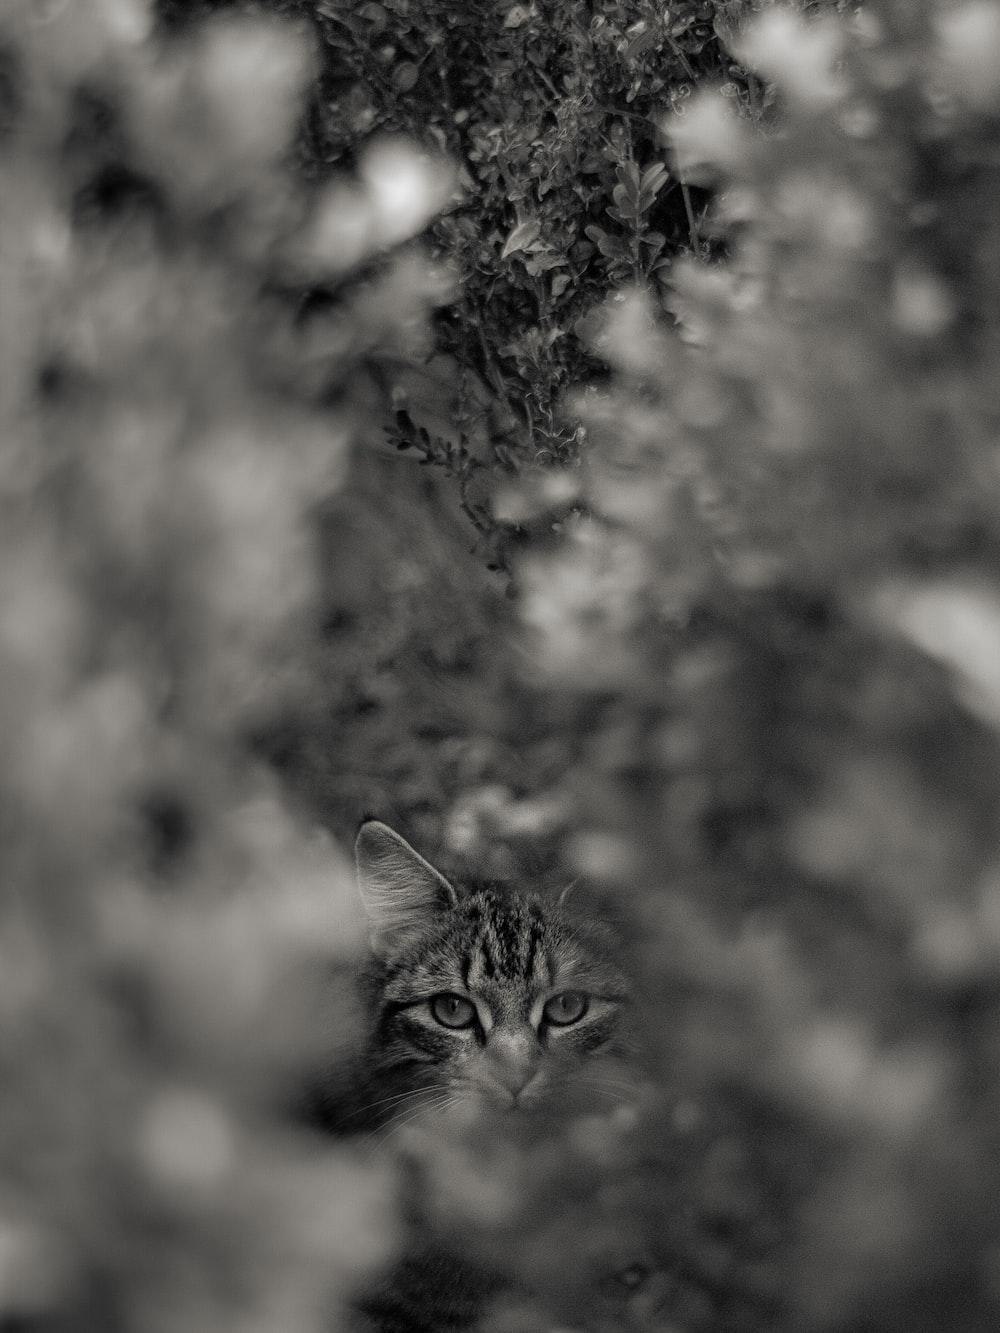 brown tabby cat in front of brown leaf tree